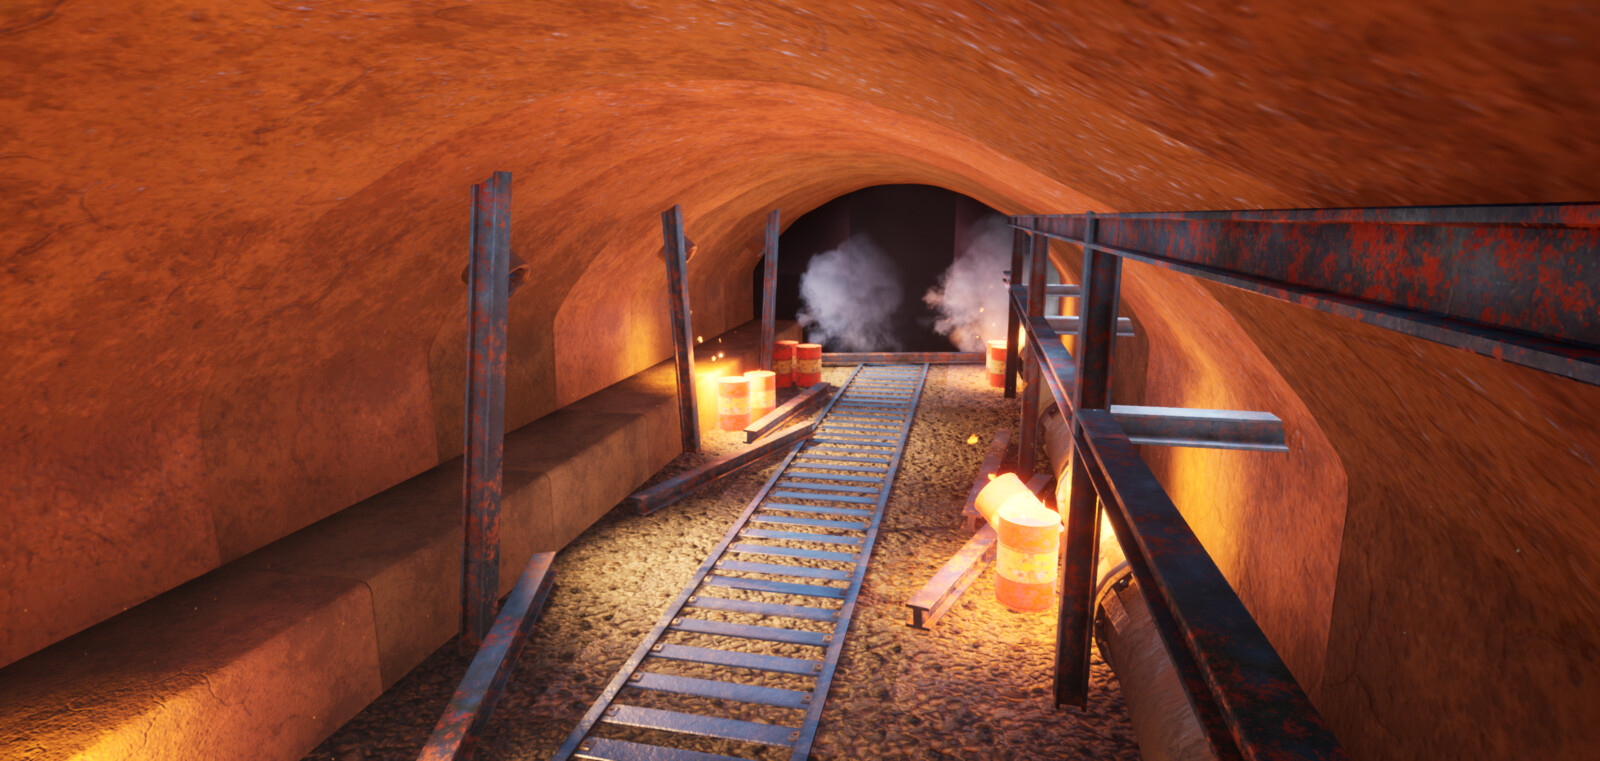 Tunnel Environment